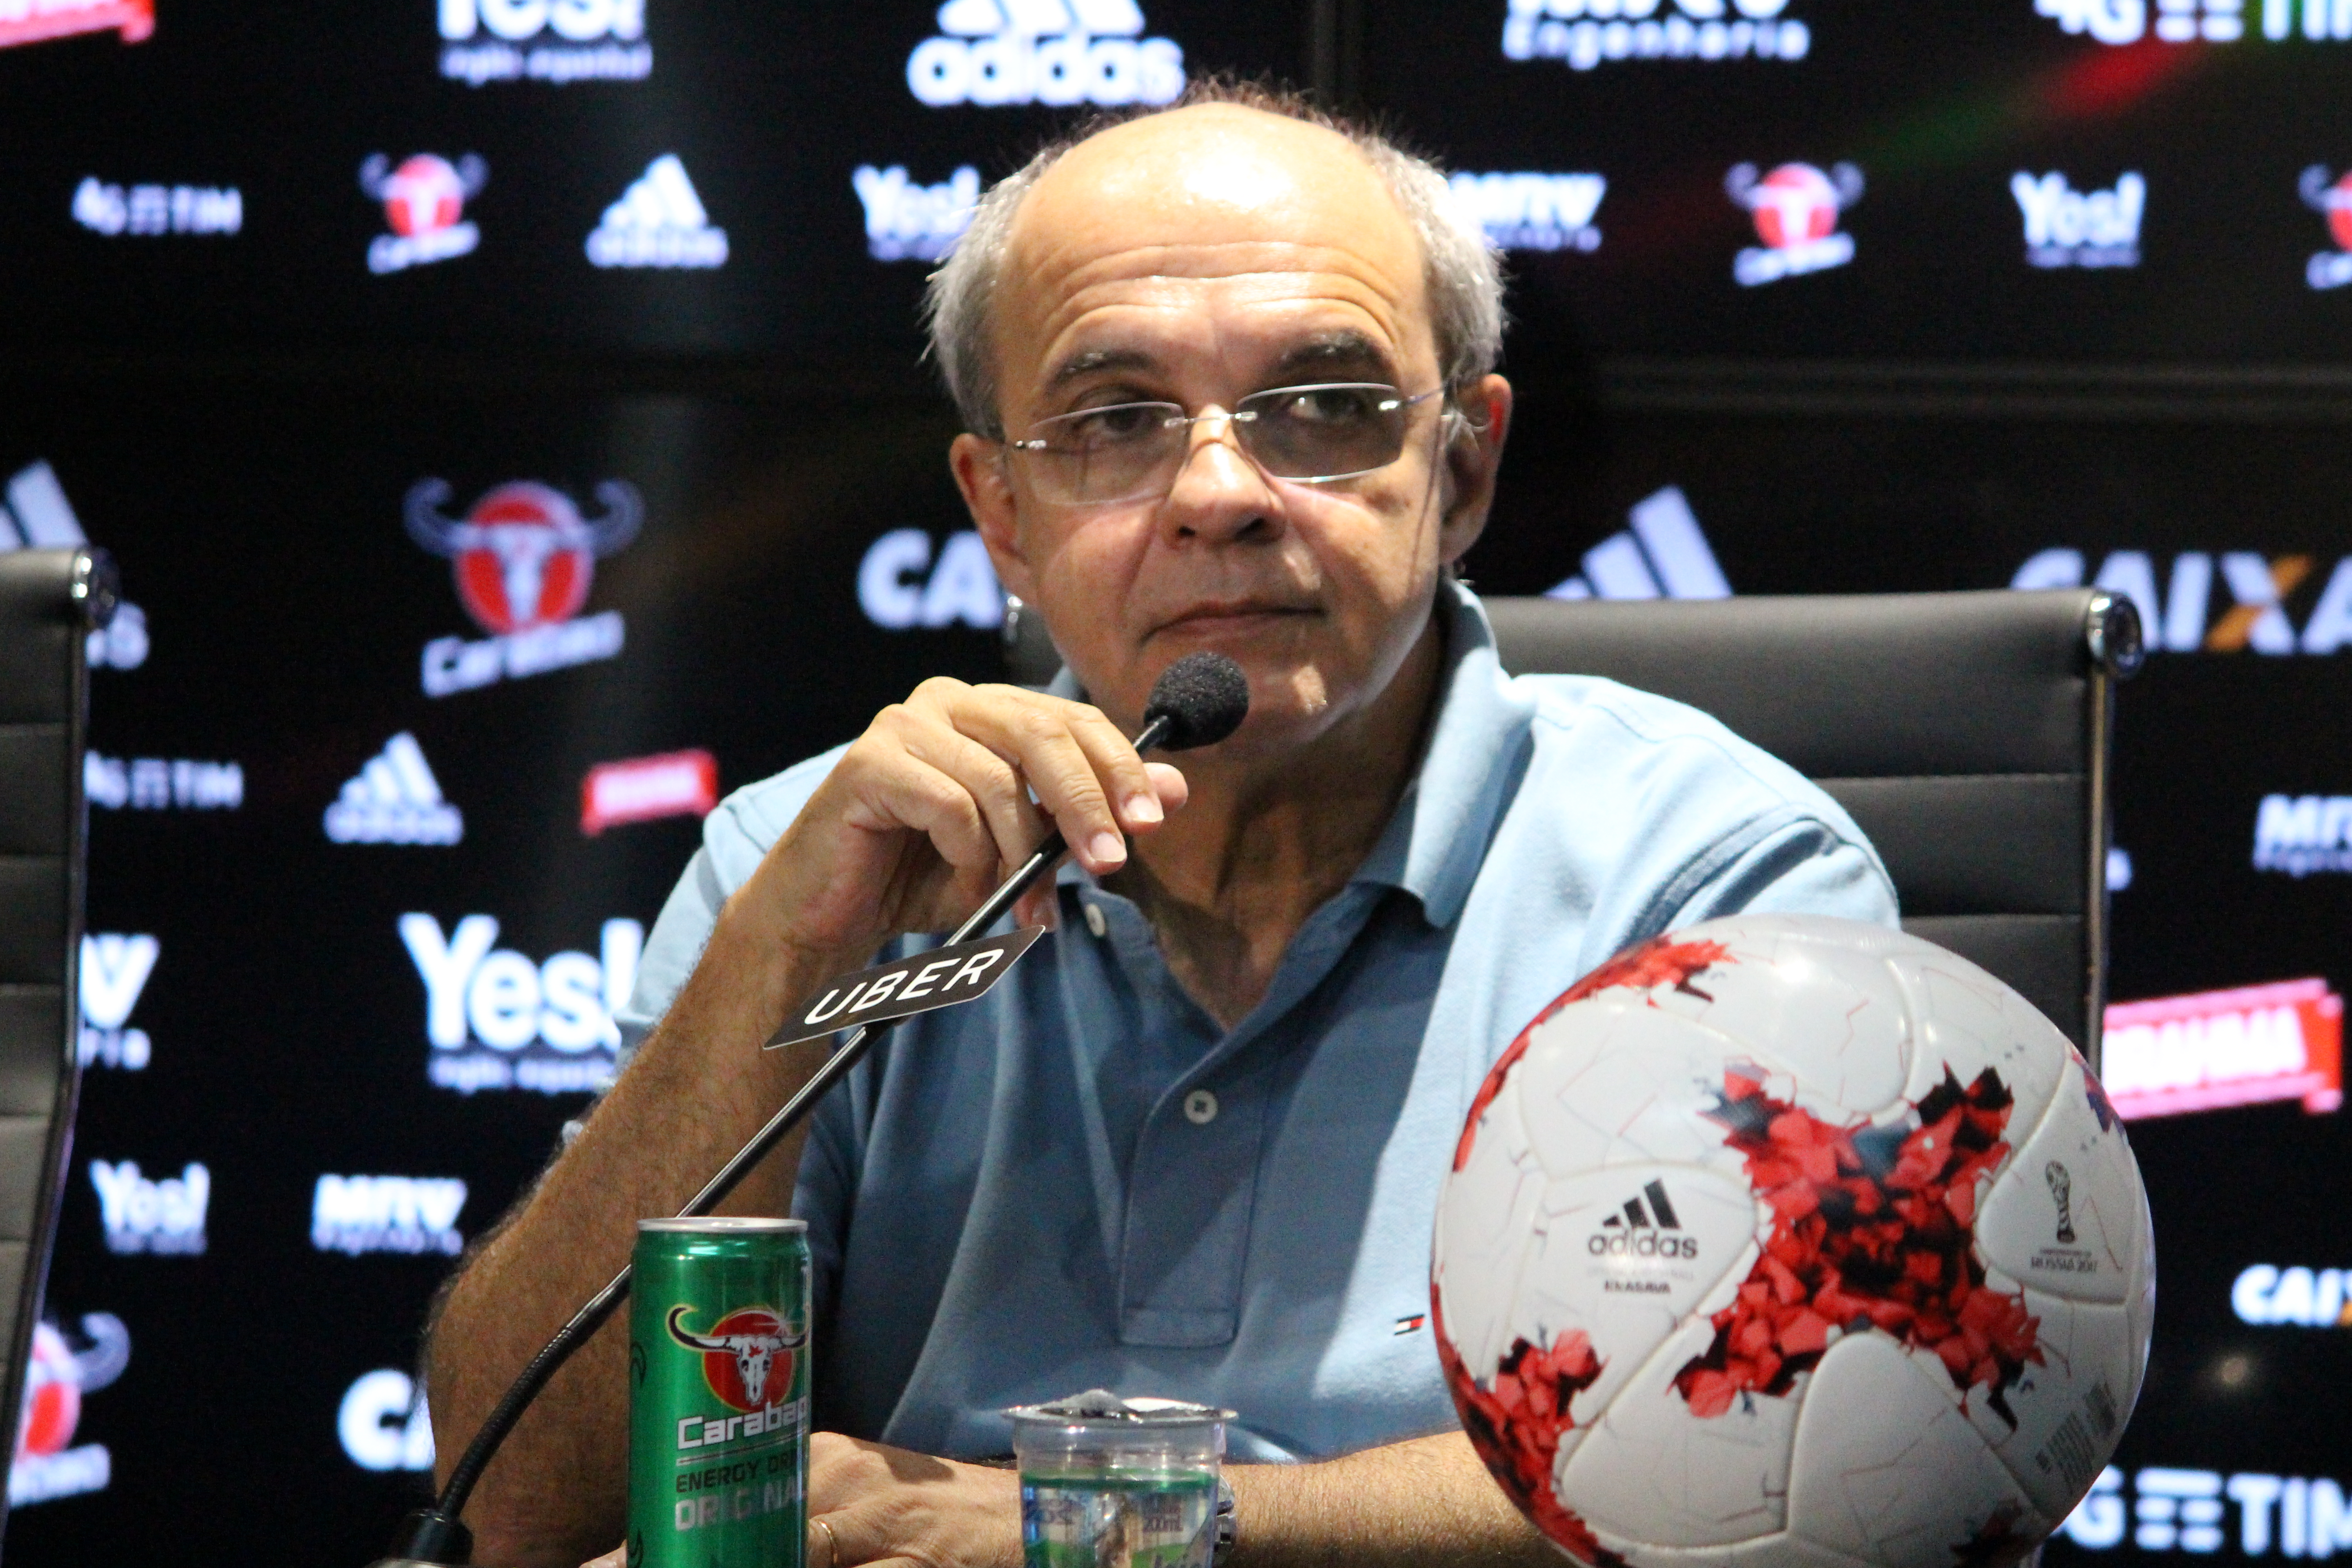 Eduardo Bandeira de Mello Flamengo 2017